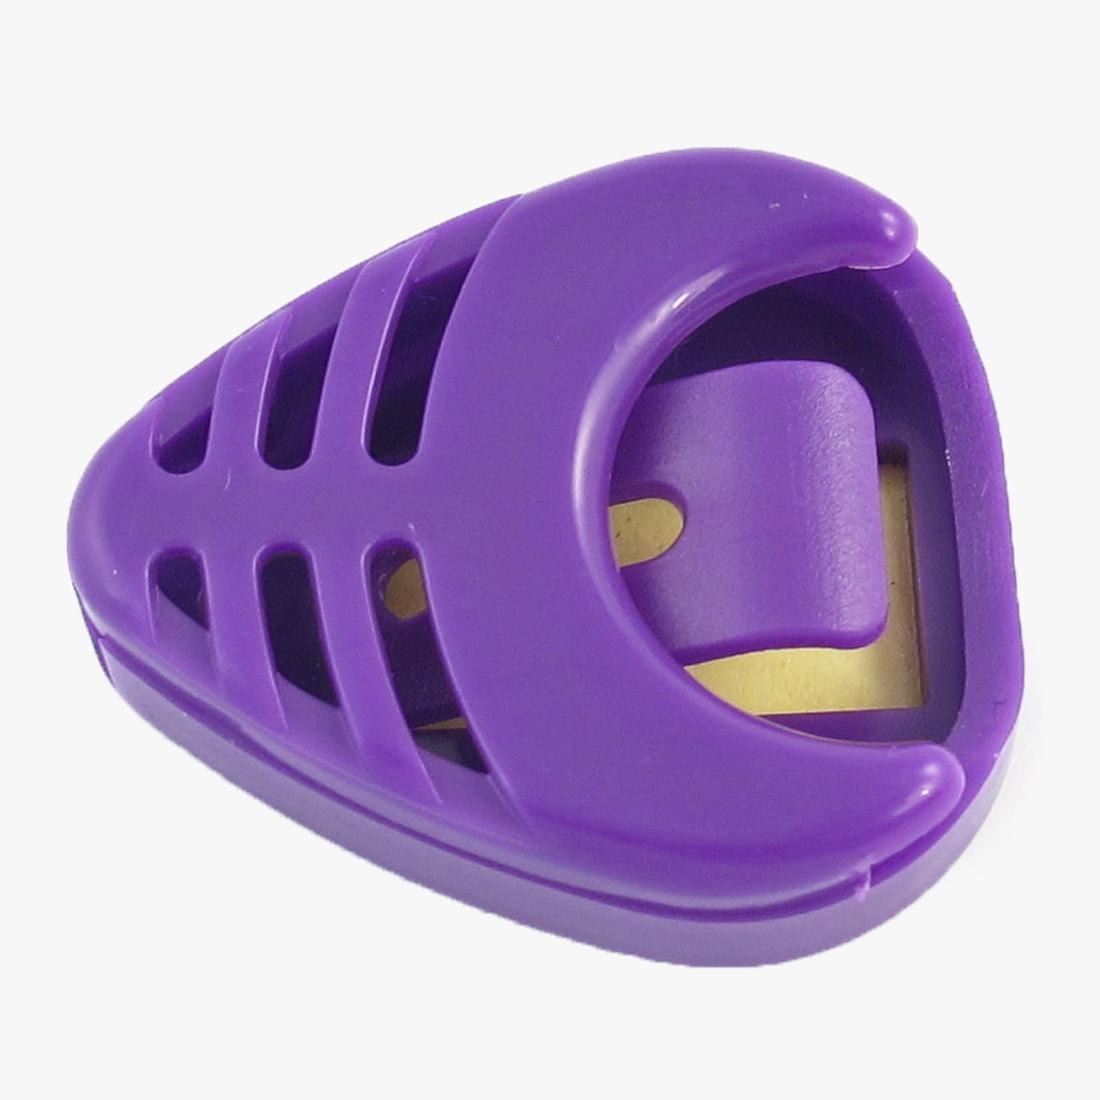 handy purple plastic guitar plectrum thumb pick case box. Black Bedroom Furniture Sets. Home Design Ideas